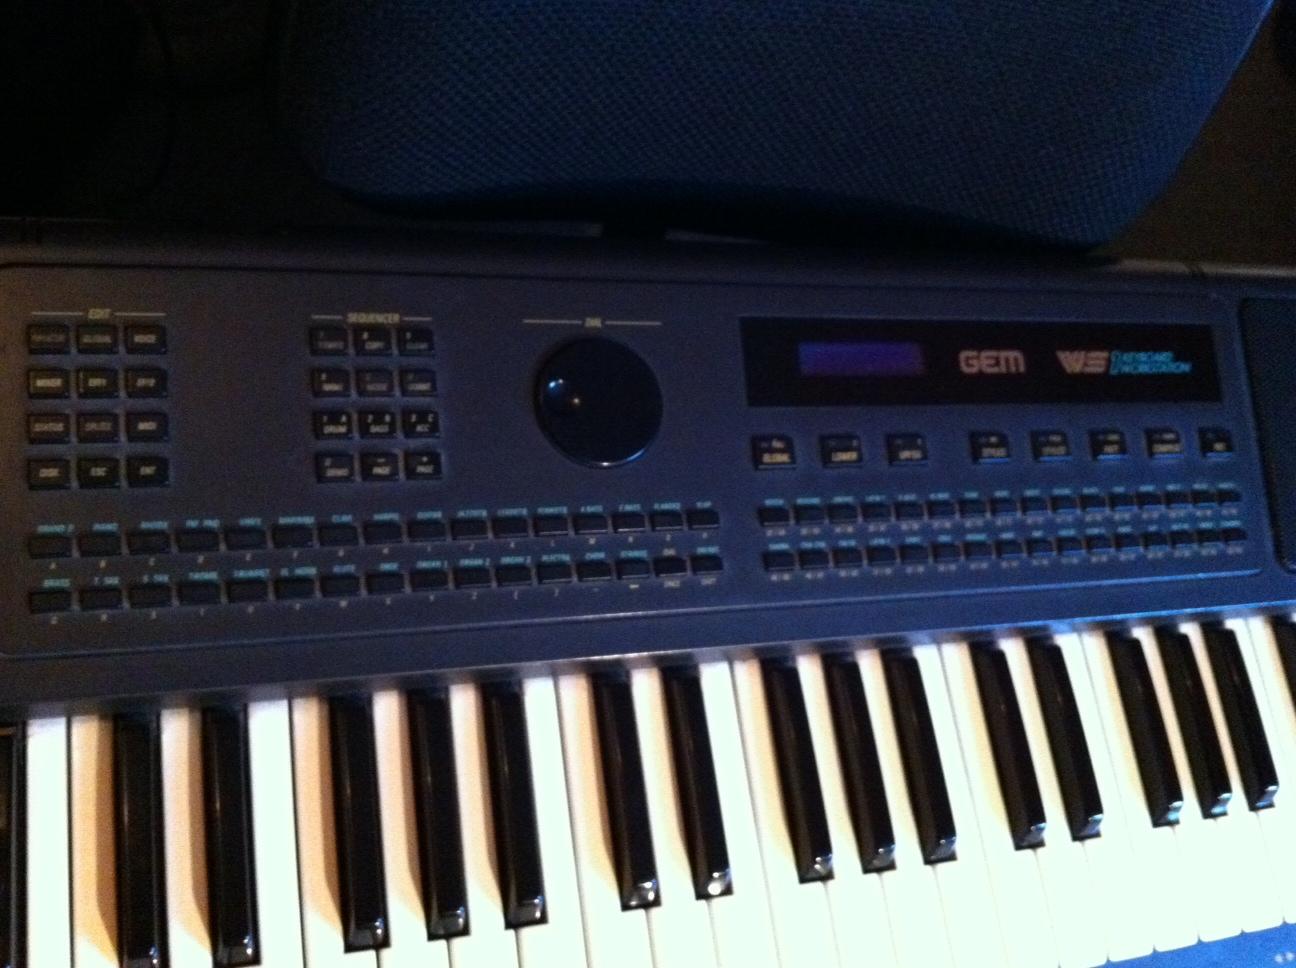 Gem Ws1 Keyboard Workstation Manual